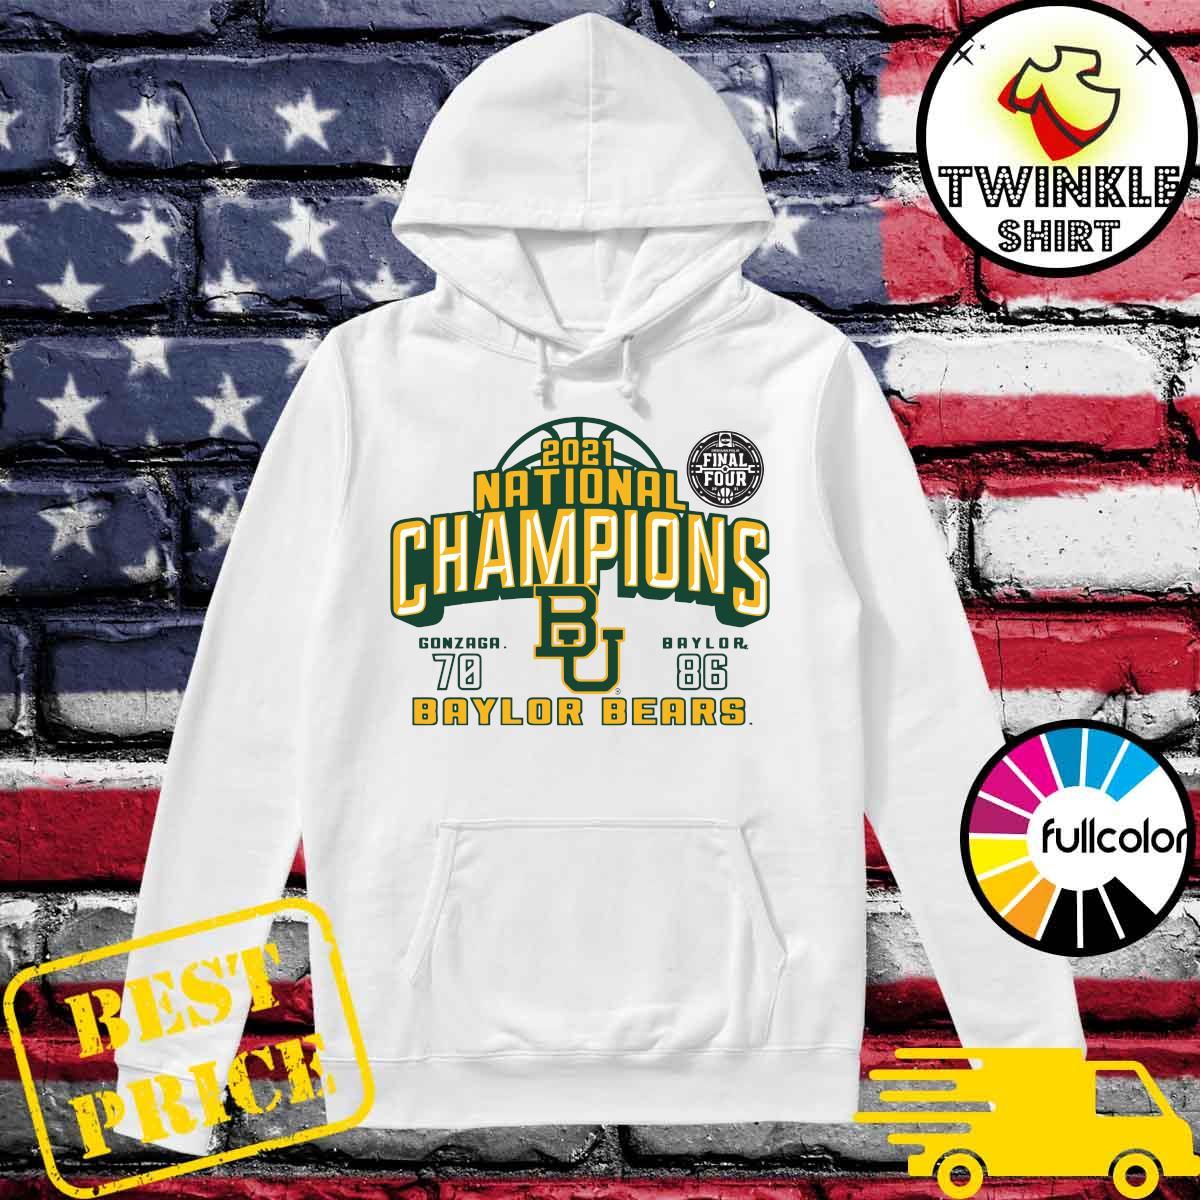 Baylor Bears 2021 NCAA Men's Basketball National Champions With Gonzaga 70 Vs Baylor 86 T-s Hoodie